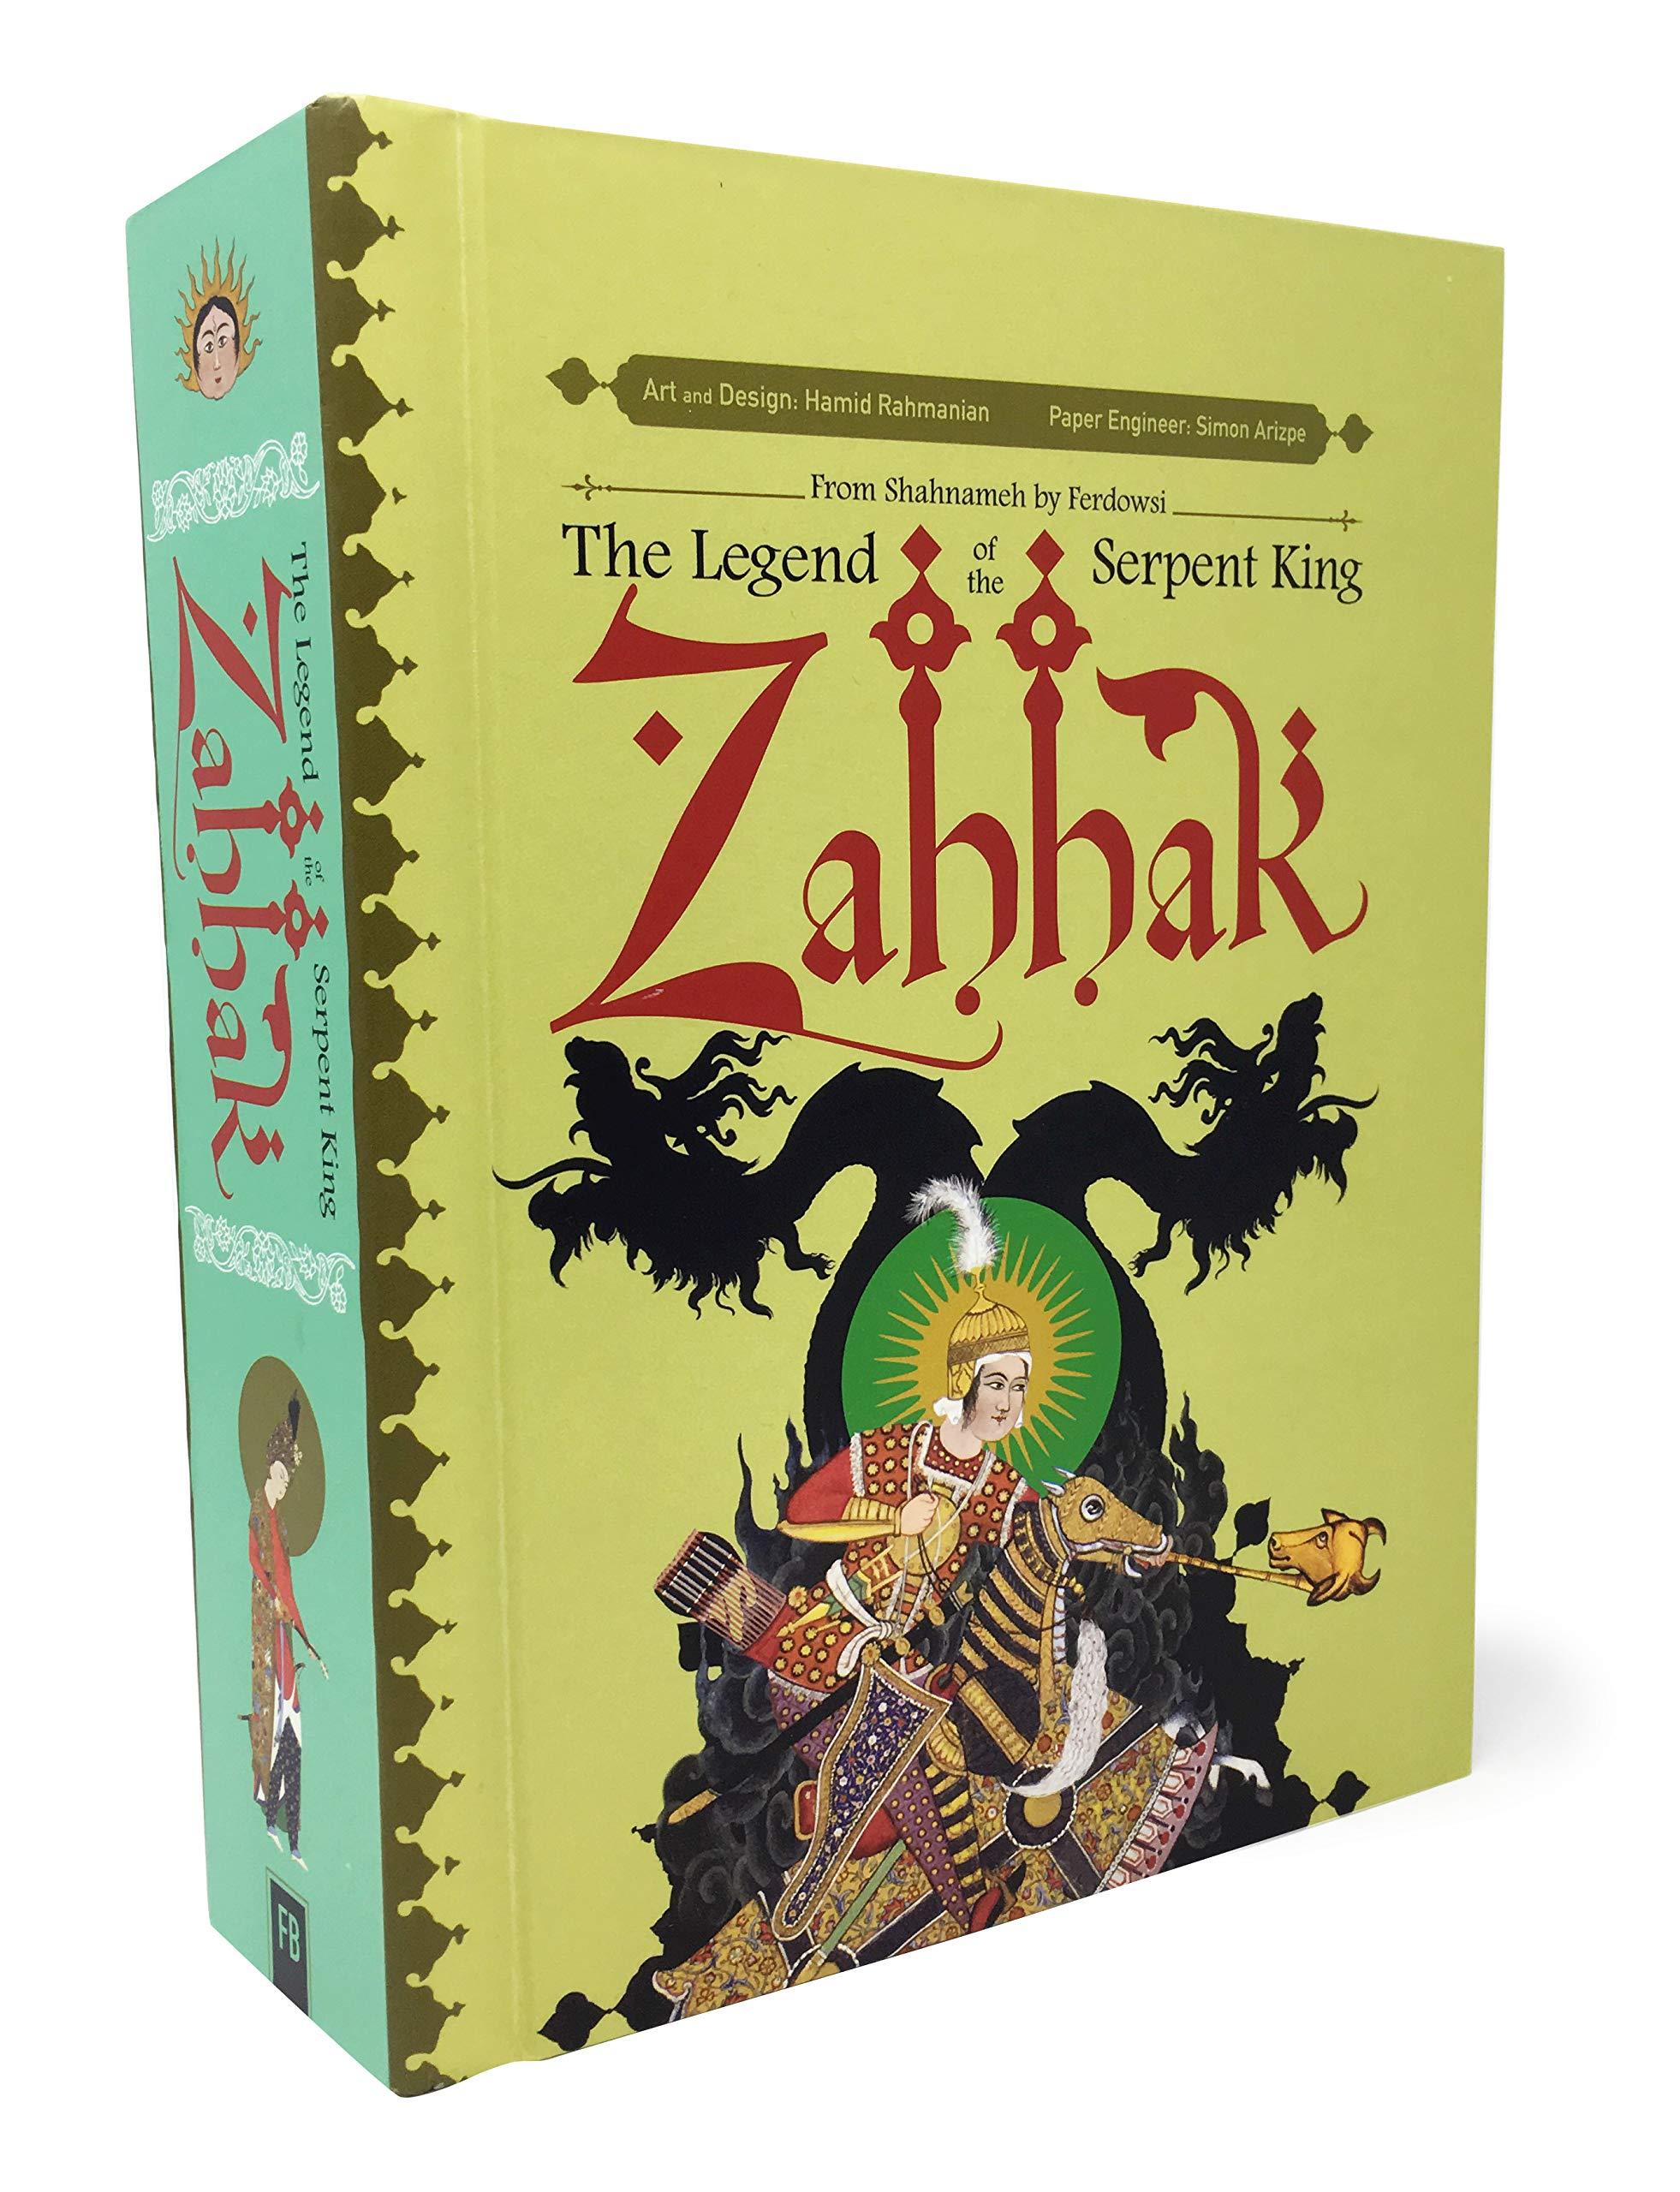 Zahhak The Legend The Serpent King Amazon Hamid Rahmanian